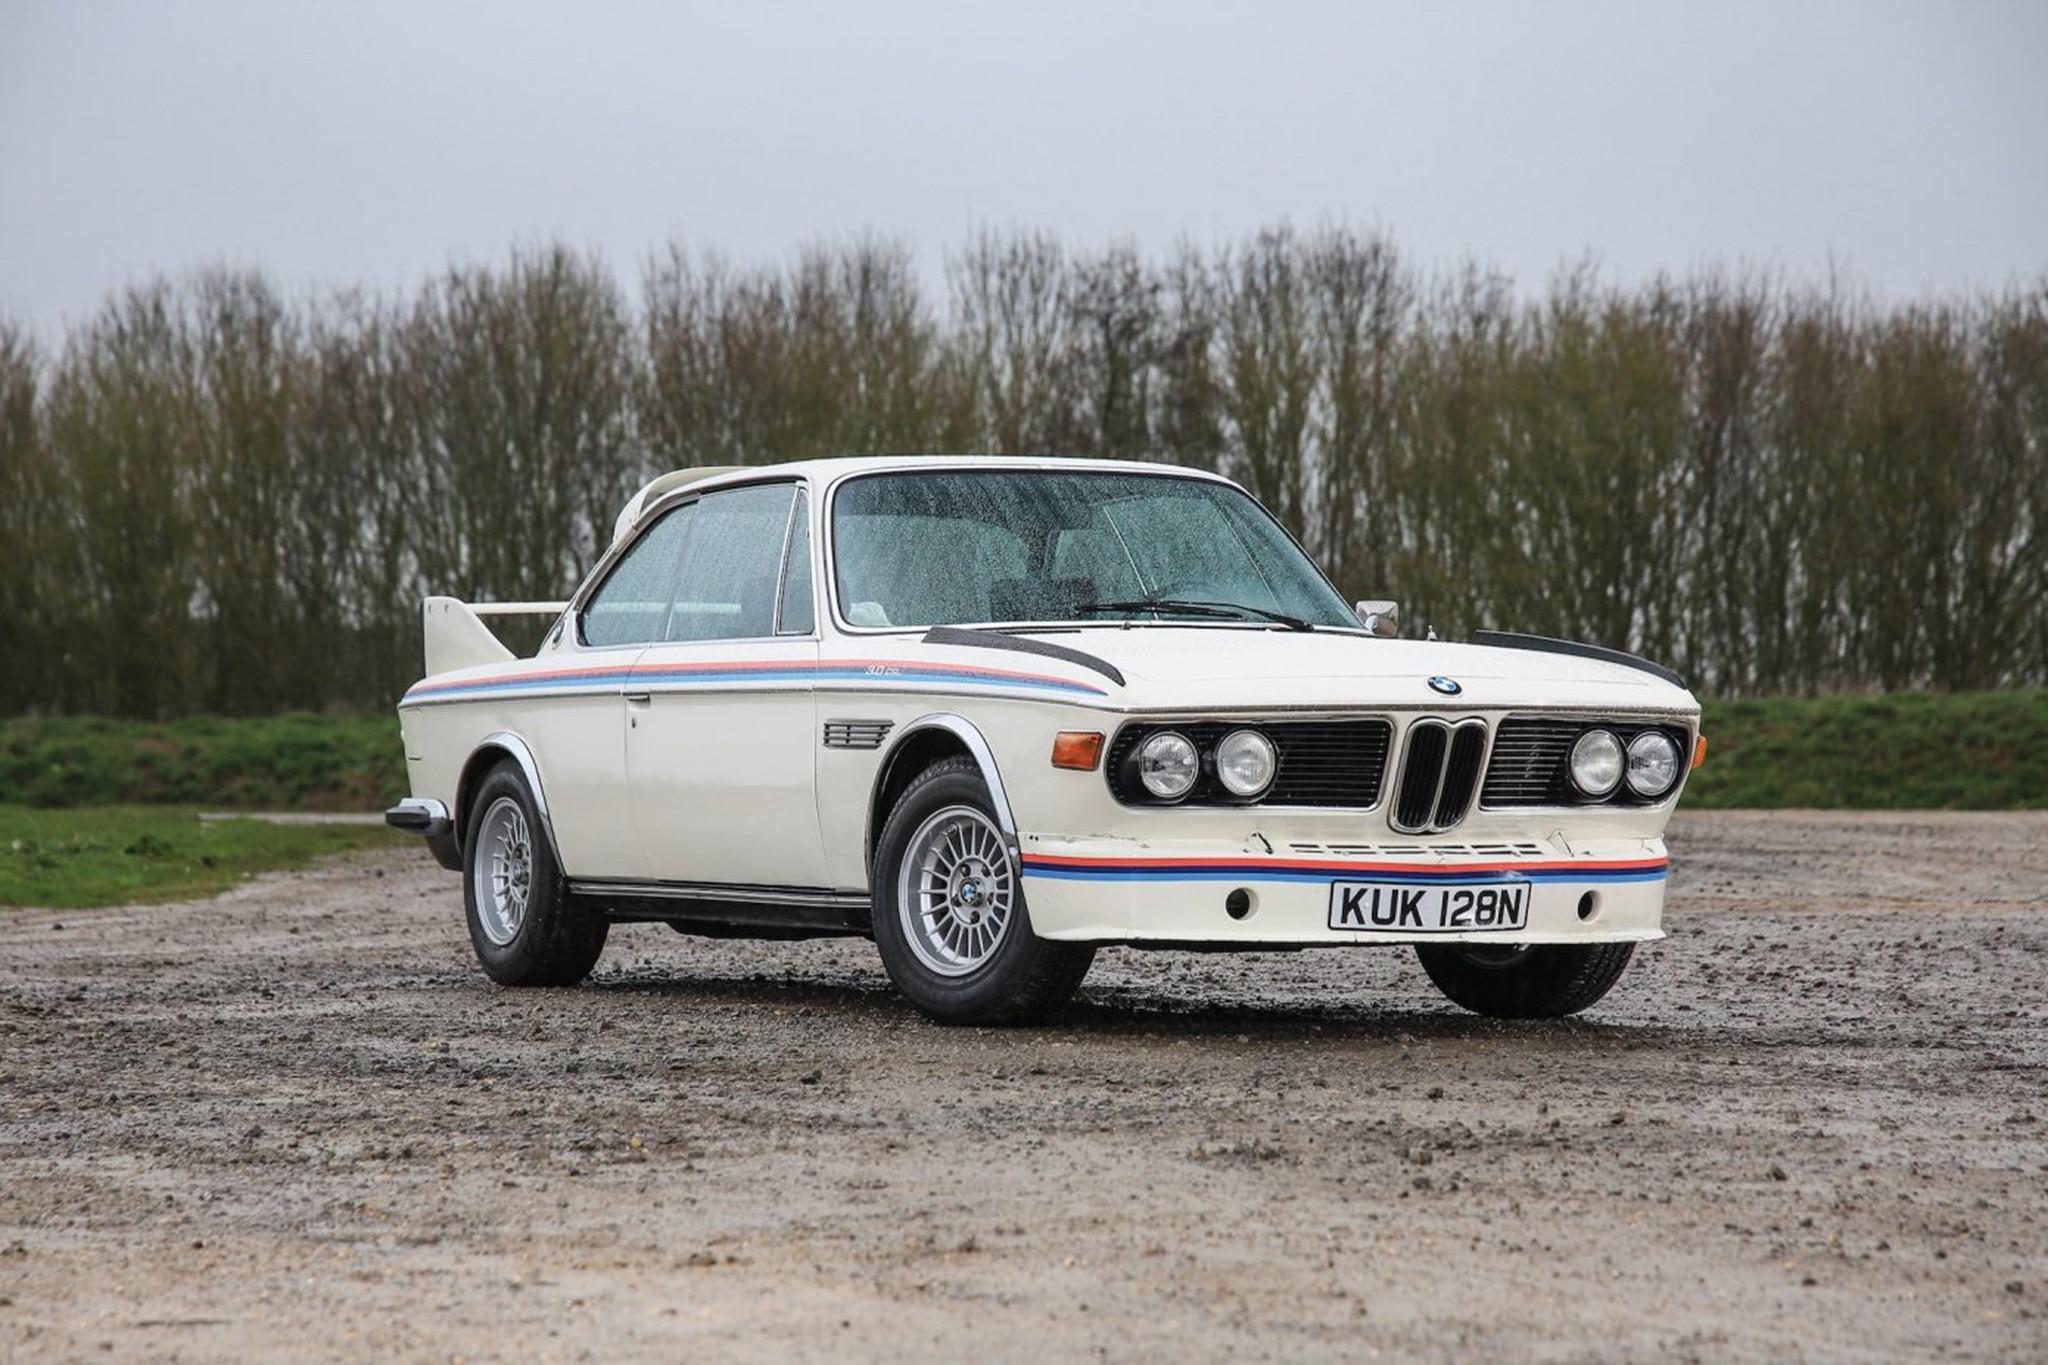 1975-BMW-3.0-CSL-Batmobile-Front-Three-Q